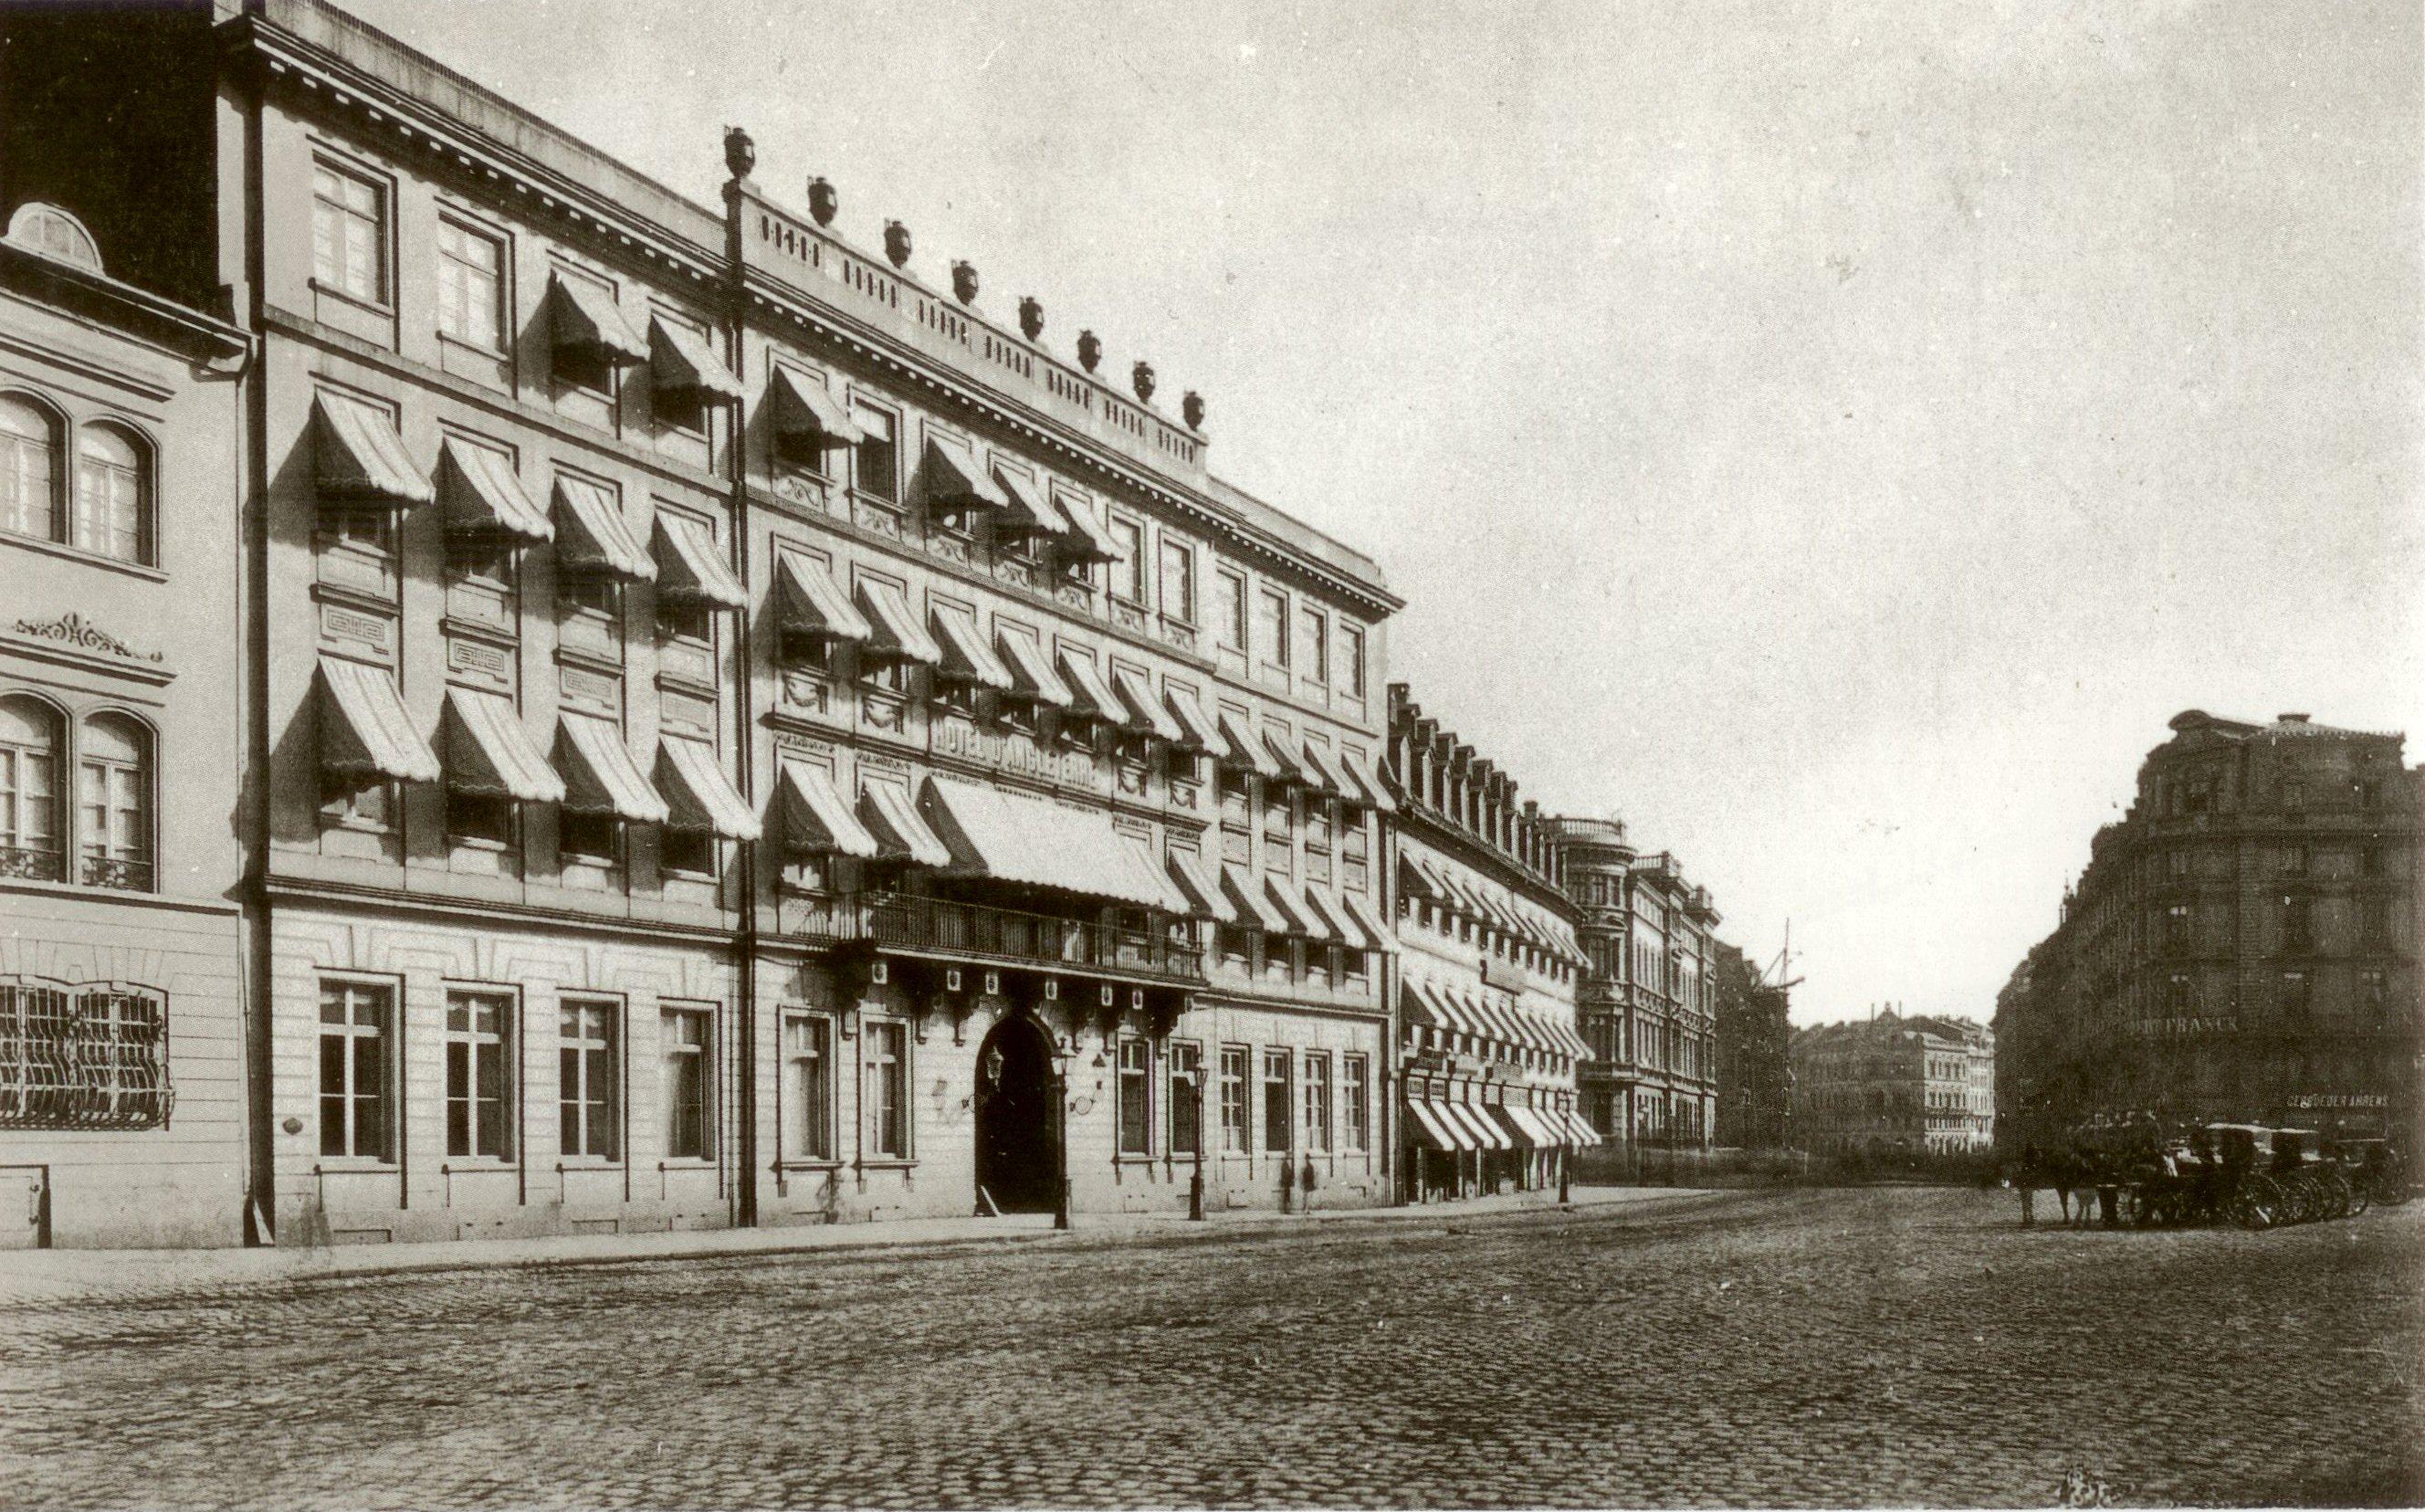 https://upload.wikimedia.org/wikipedia/commons/9/9b/Frankfurt_Englischer_Hof_1878.jpg